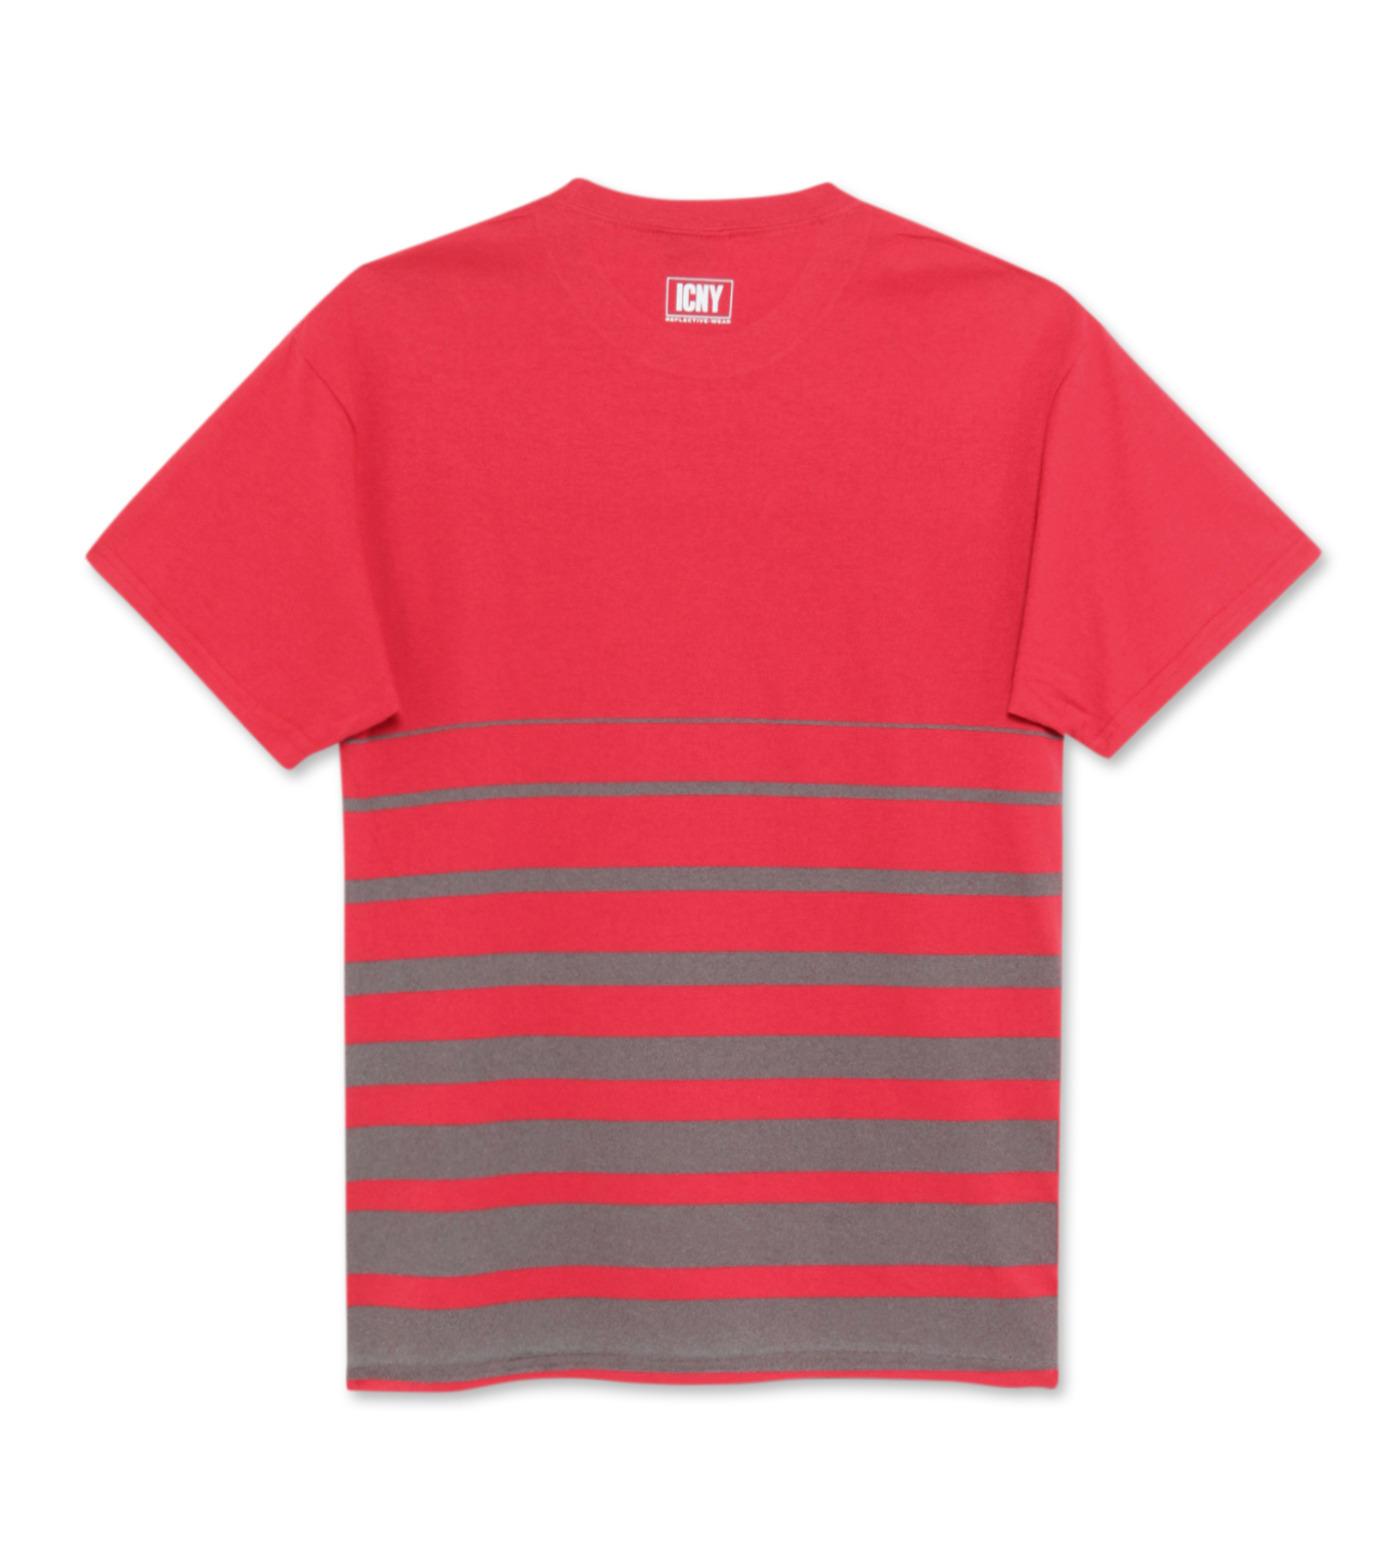 ICNY(アイ・シー・エヌ・ワイ)のGradient T-shirts-RED(T-SHIRTS/T-SHIRTS)-GRDT-62 拡大詳細画像2